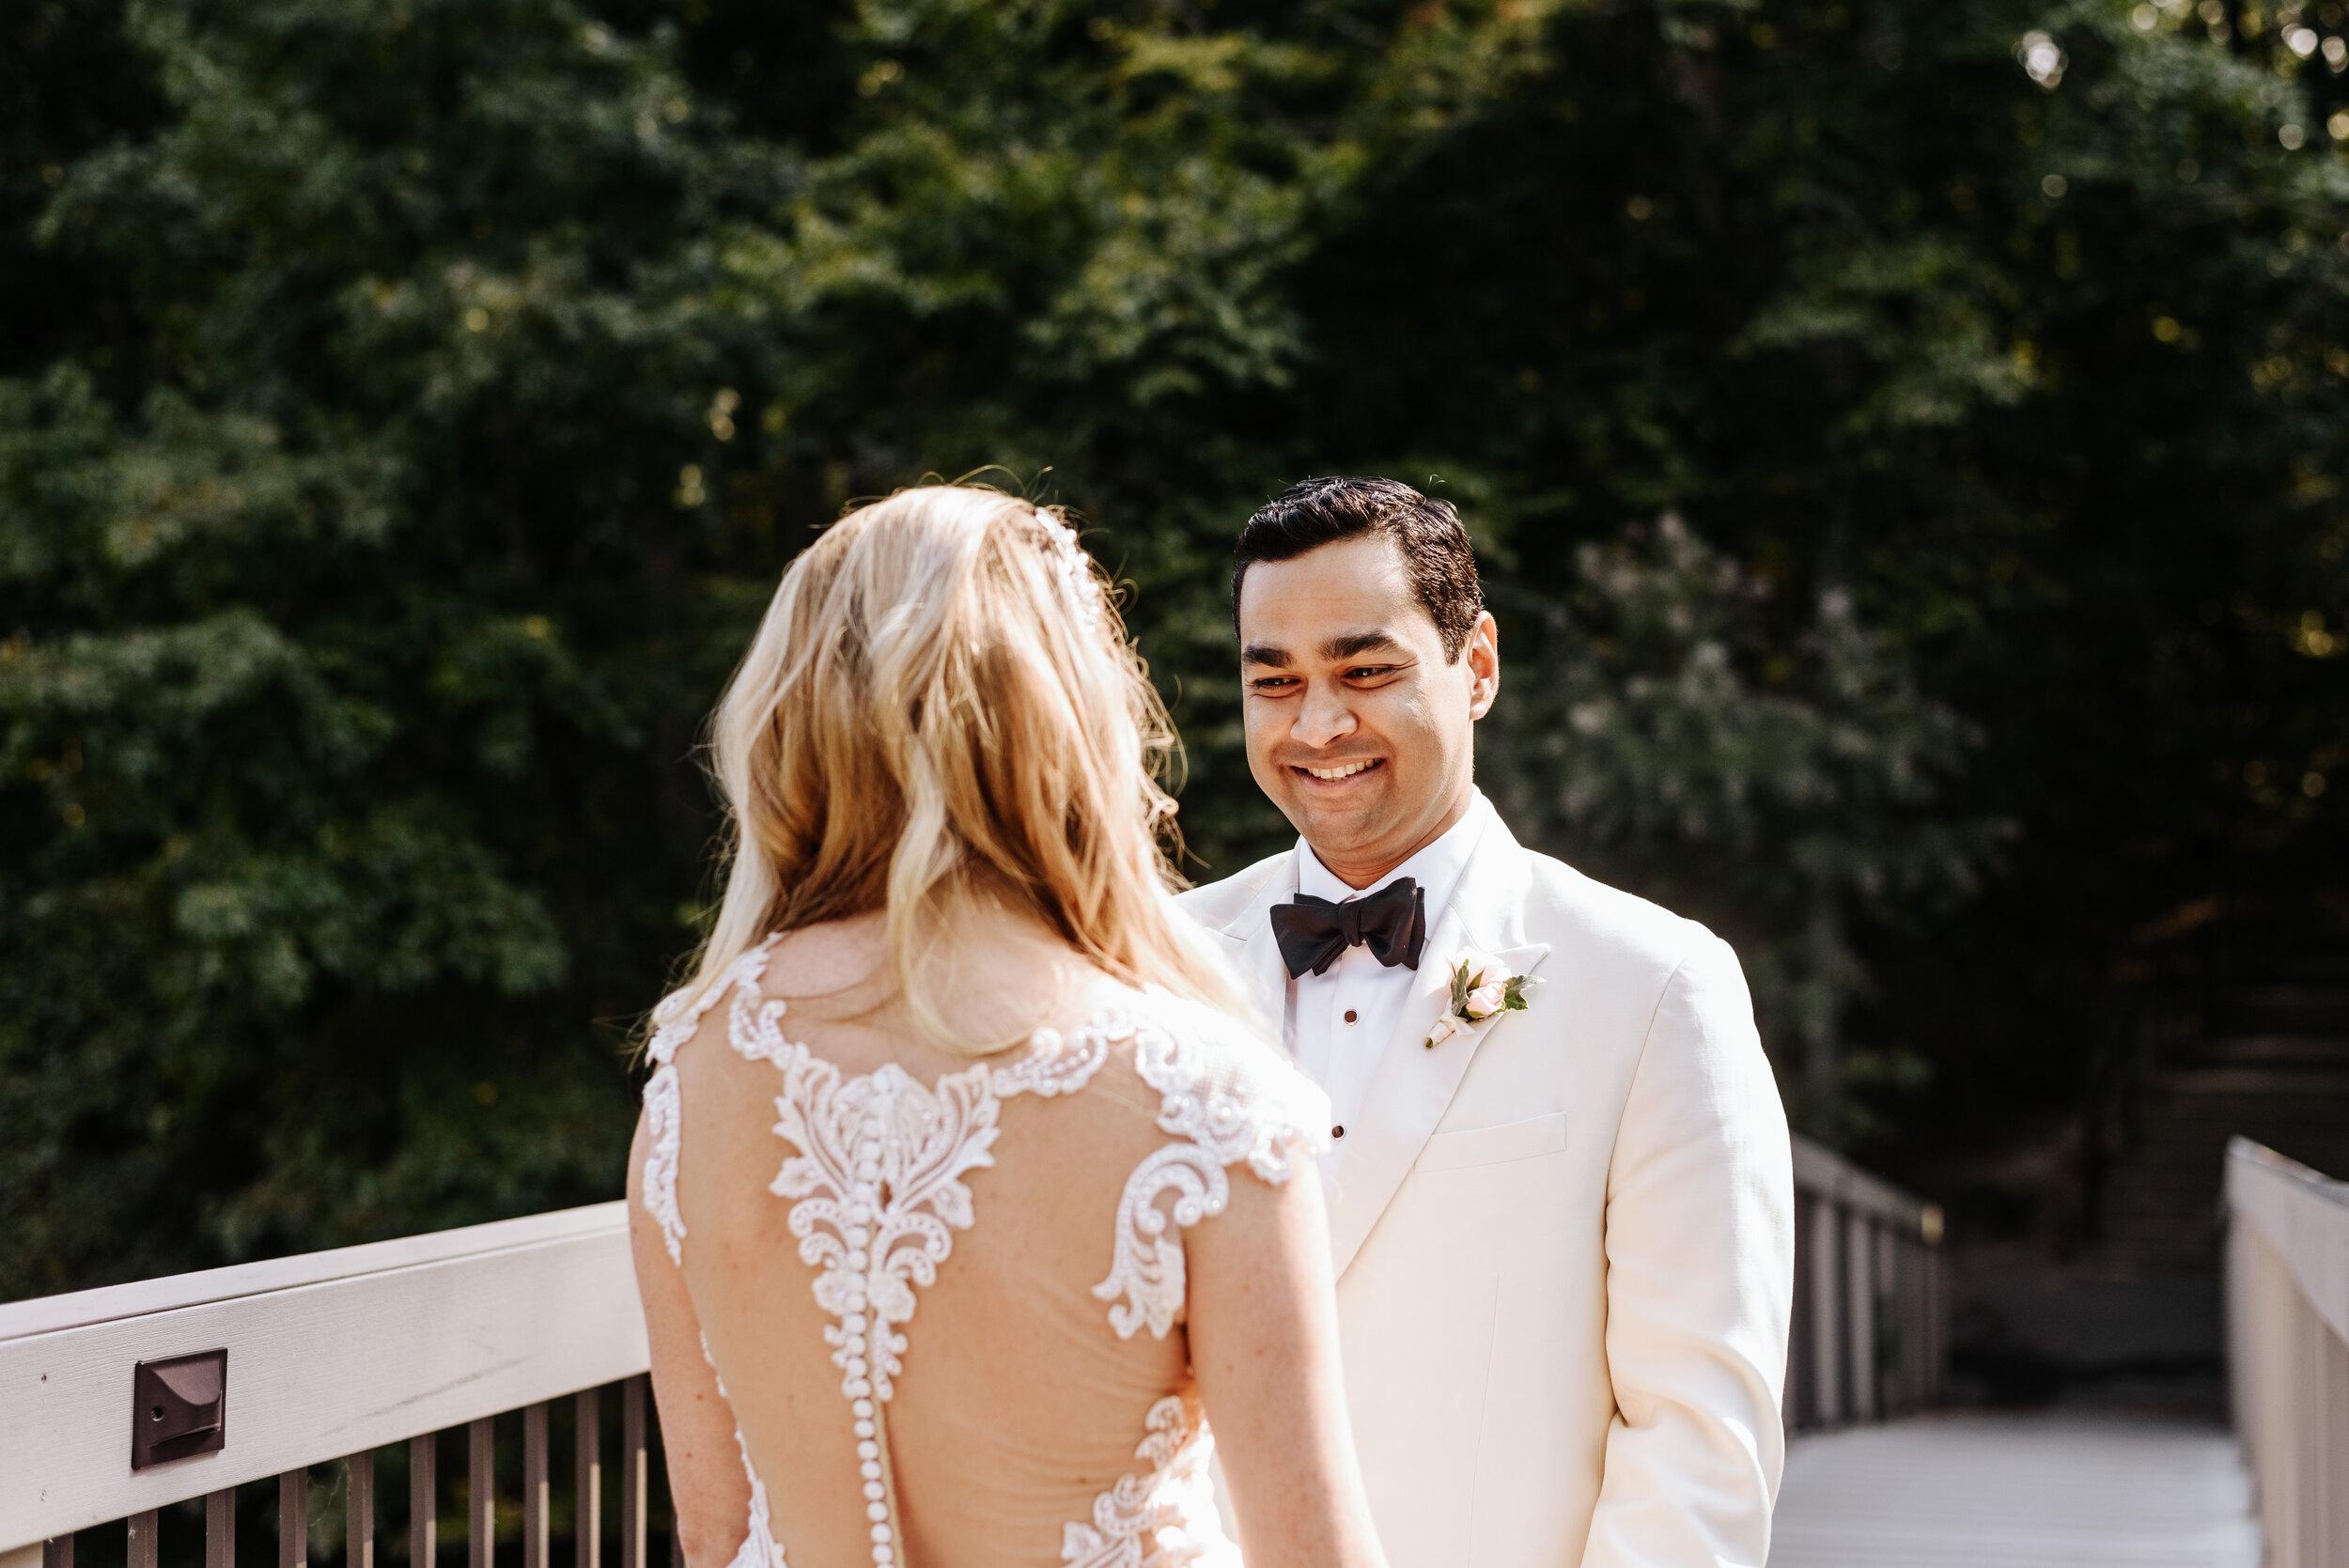 Cassie-Mrunal-Wedding-Quirk-Hotel-John-Marshall-Ballrooms-Richmond-Virginia-Photography-by-V-42.jpg